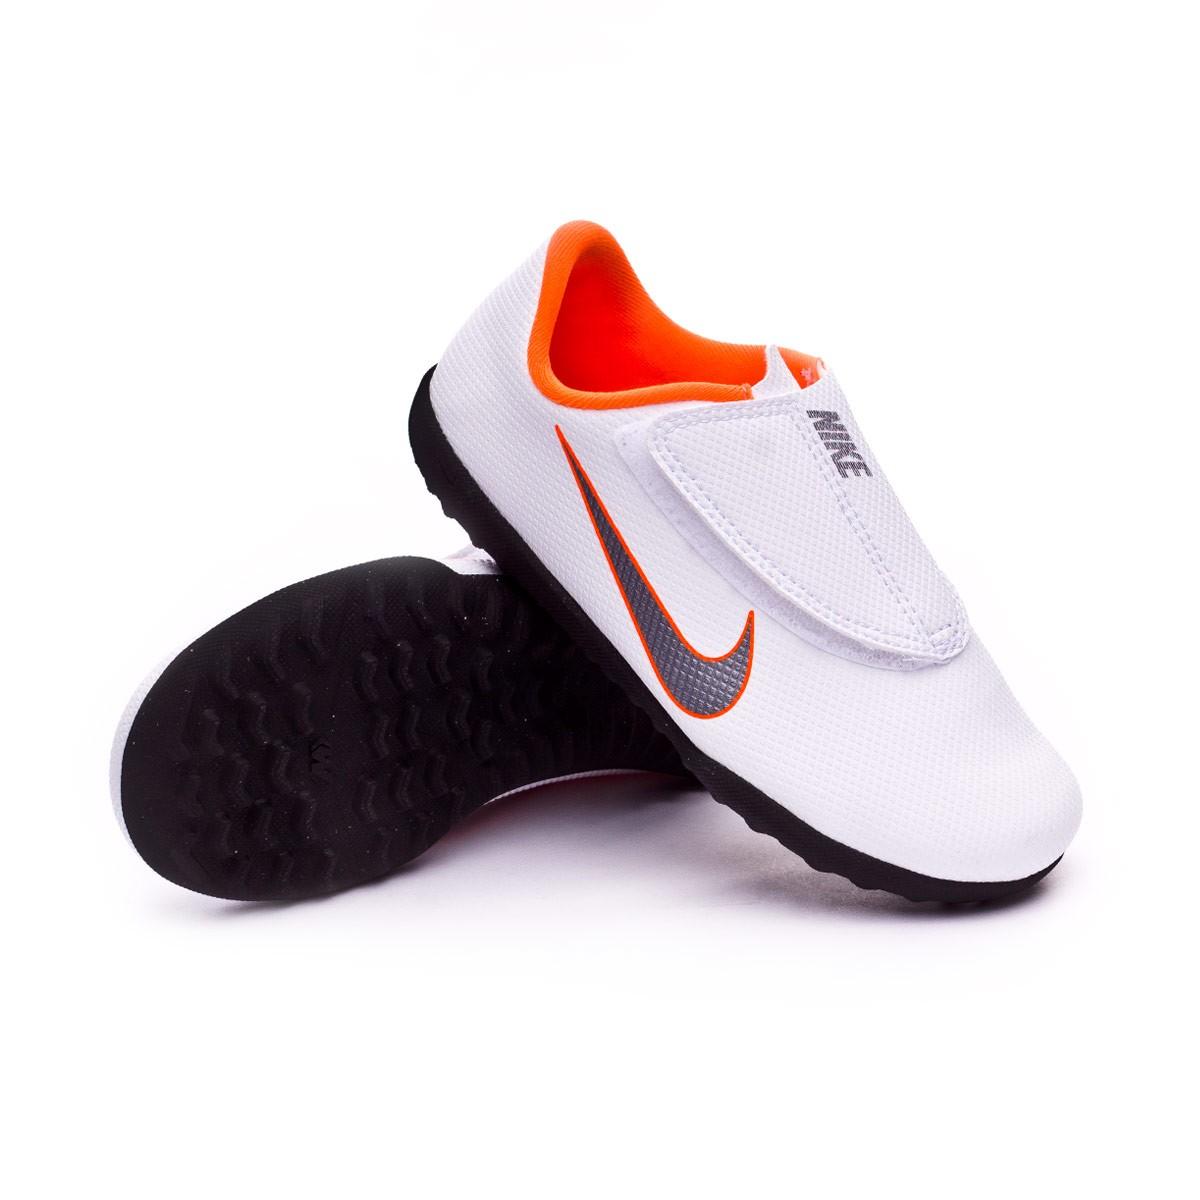 40c76445d06c2 ... sale football boot nike kids mercurial vaporx xii club ps velcro turf  ff8fd 3ecae